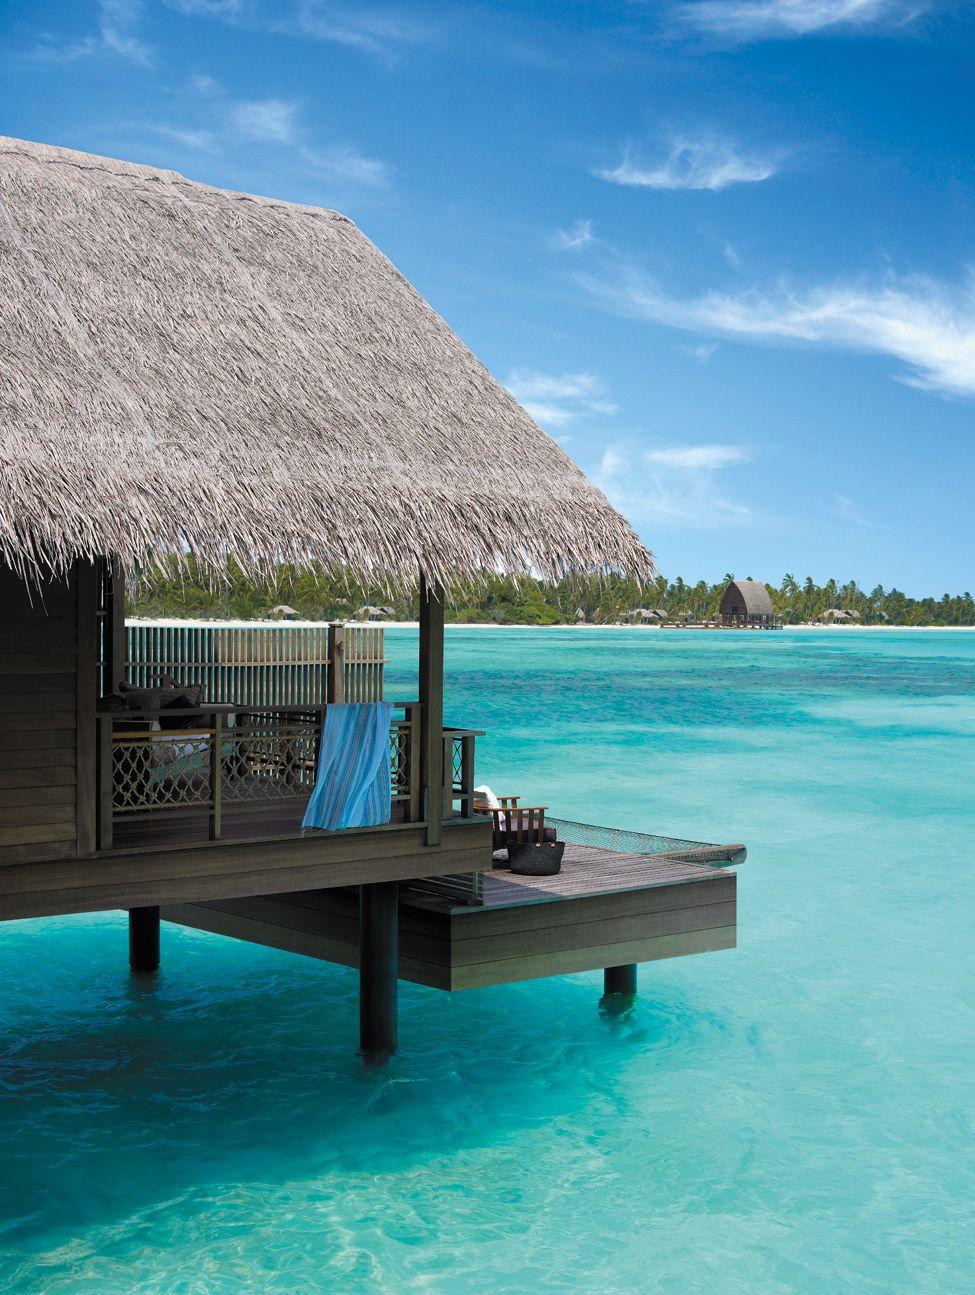 Maldives - our honeymoon :-)